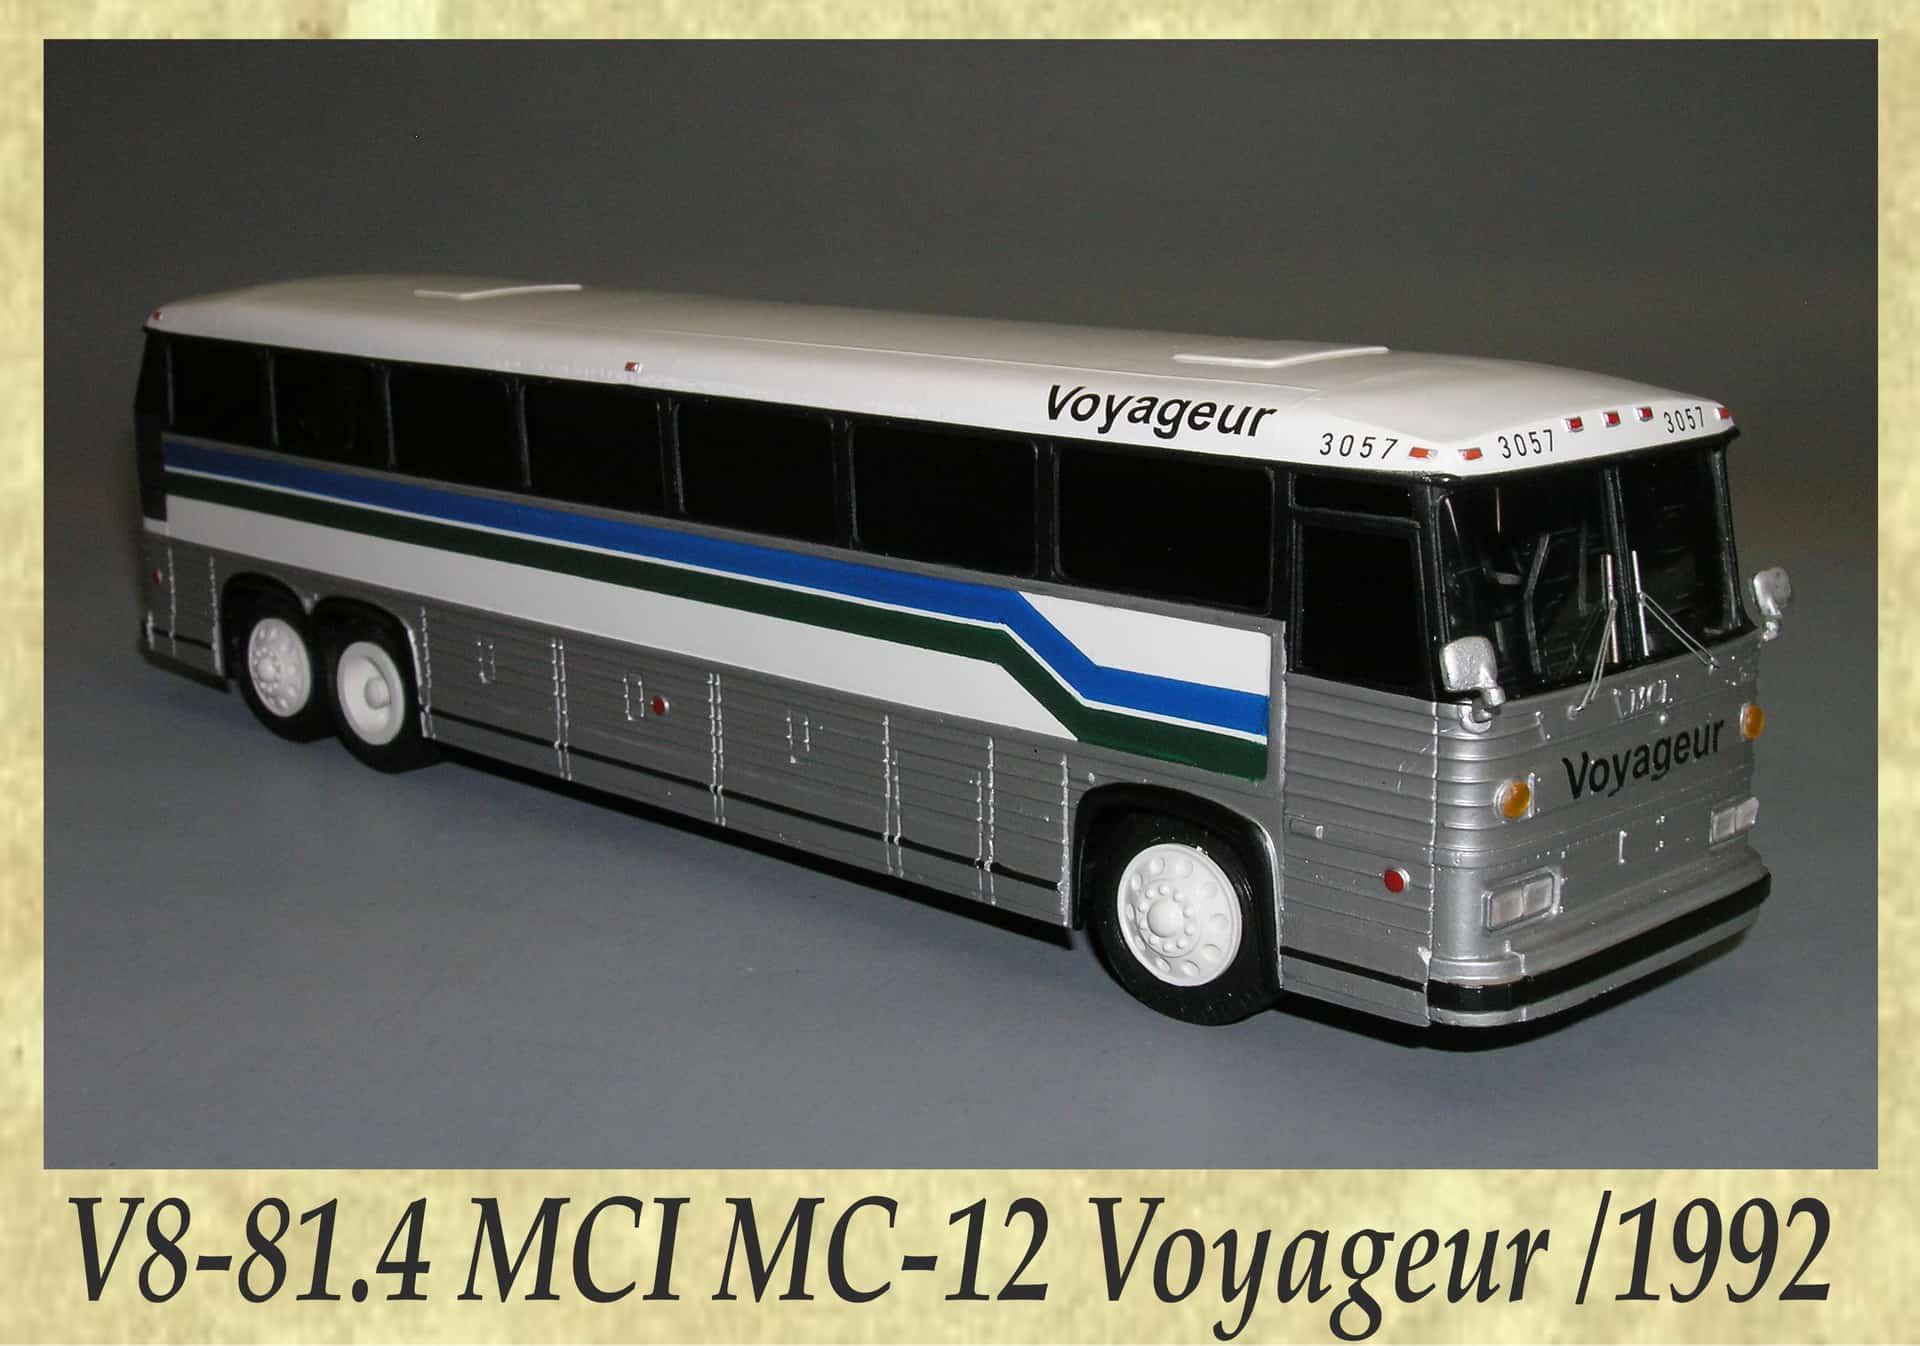 V8-81.4 MCI MC-12 Voyageur 1992